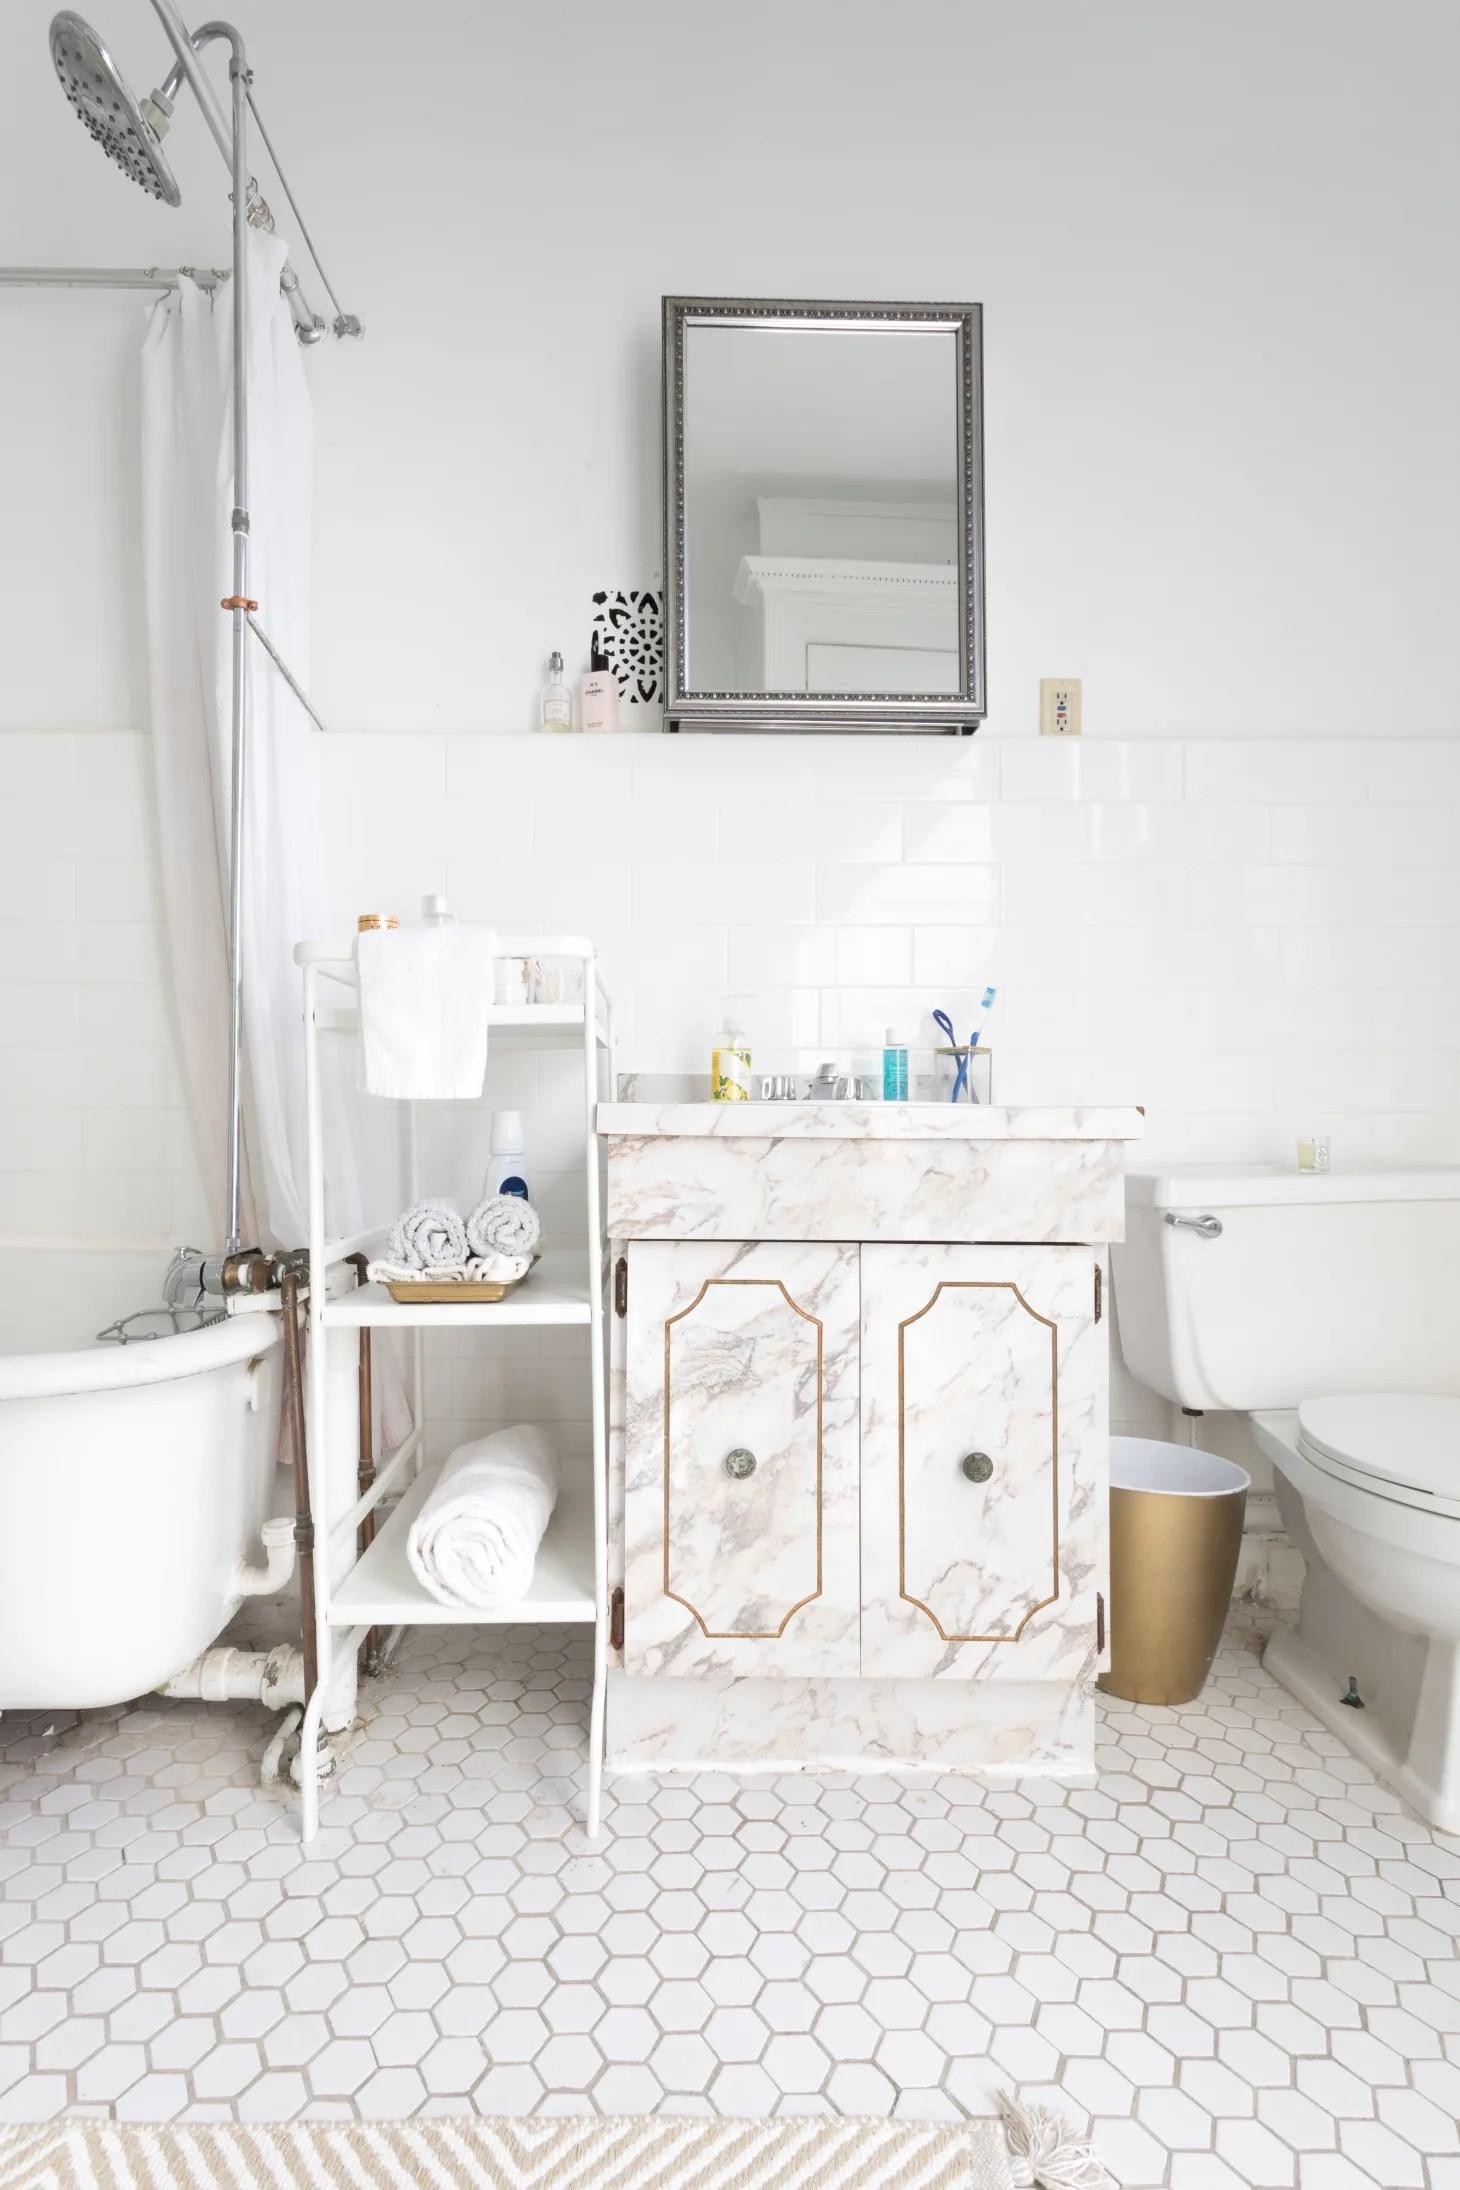 25 Small Bathroom Storage & Design Ideas - Storage ... on Apartment Bathroom Ideas  id=29123